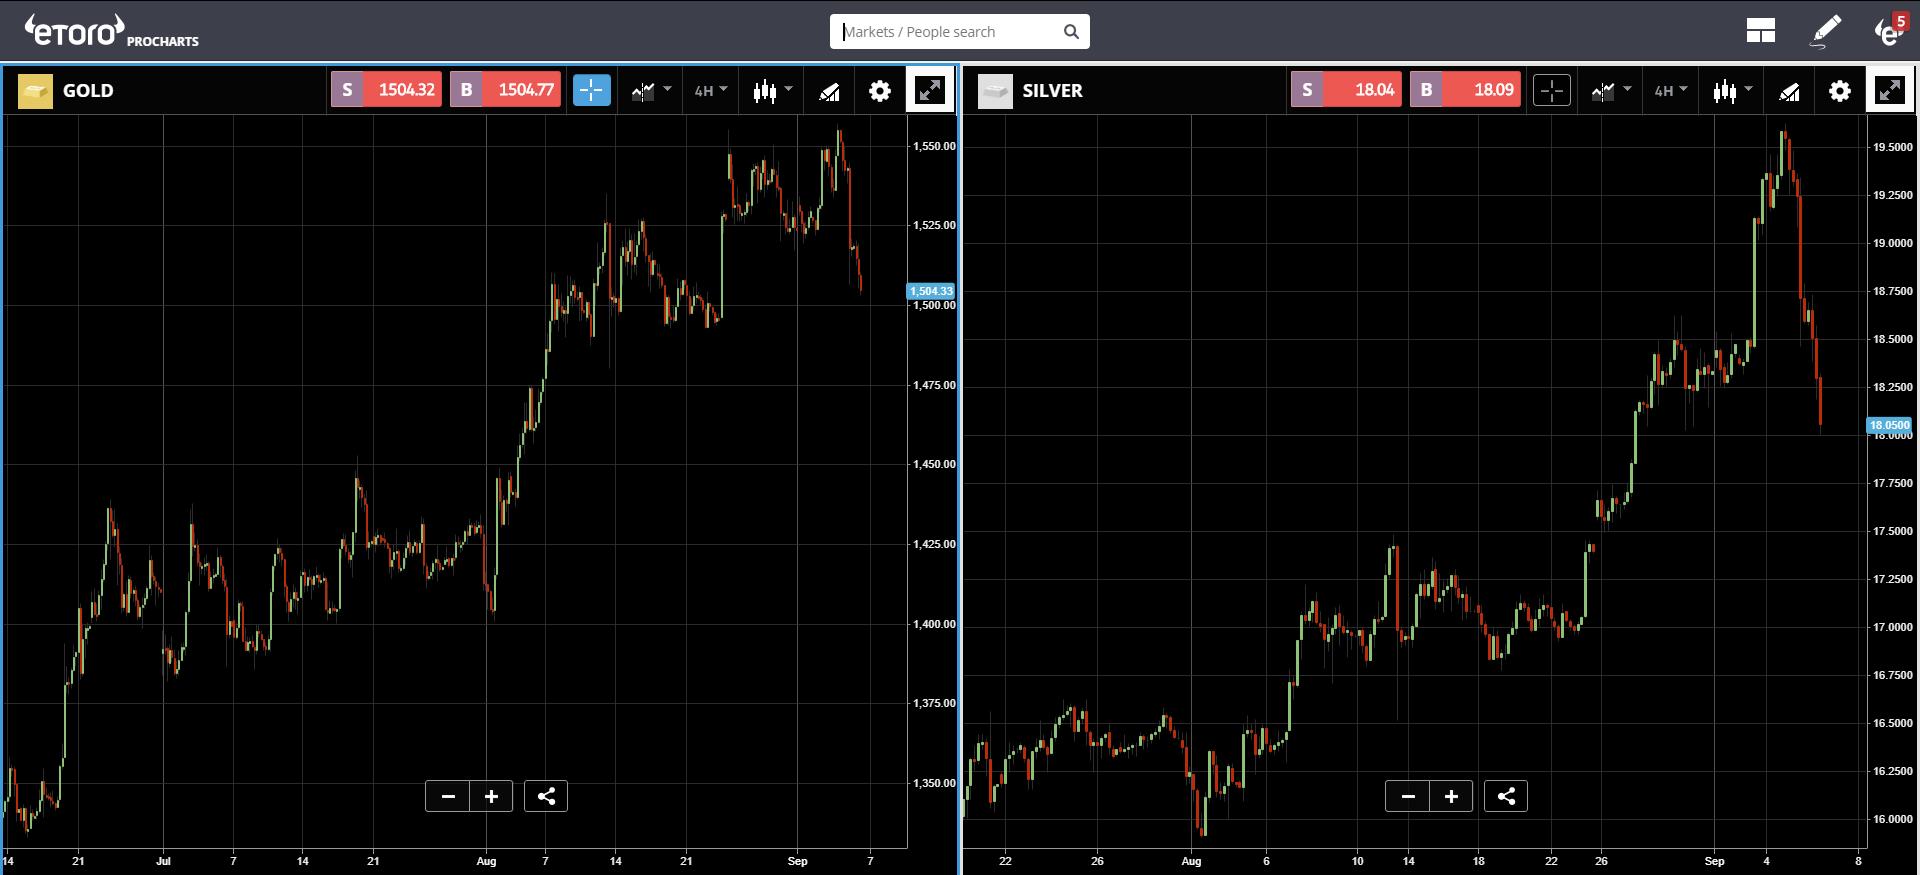 market, crypto, cryptocurrency, bitcoin, ethereum, blockchain, trading, profits